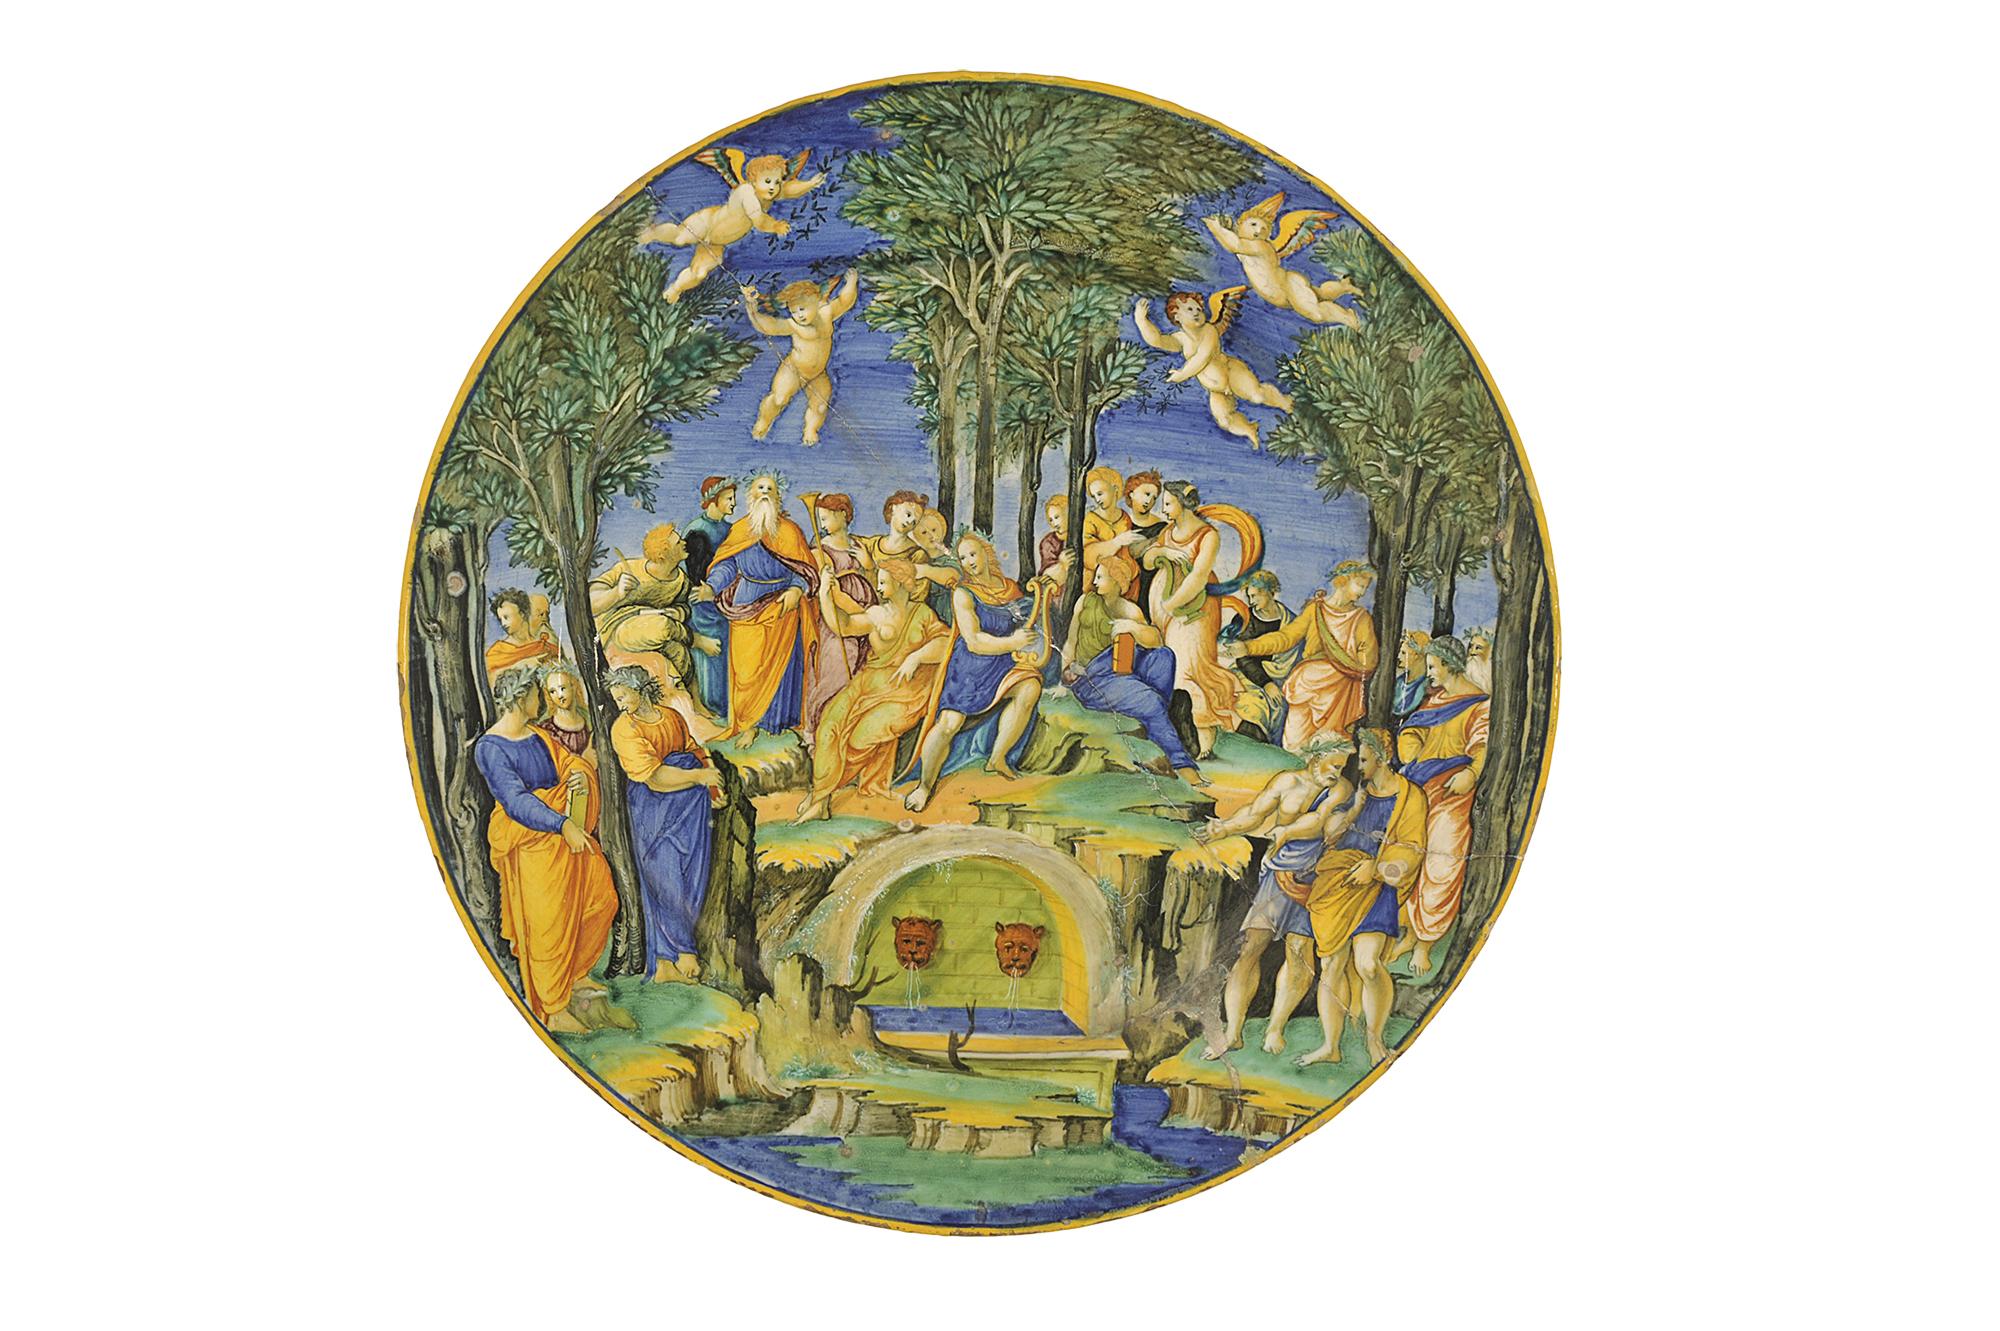 Le Parnasse, Guido FONTANA, faïence d'Urbino, Italie, vers 1530-1540